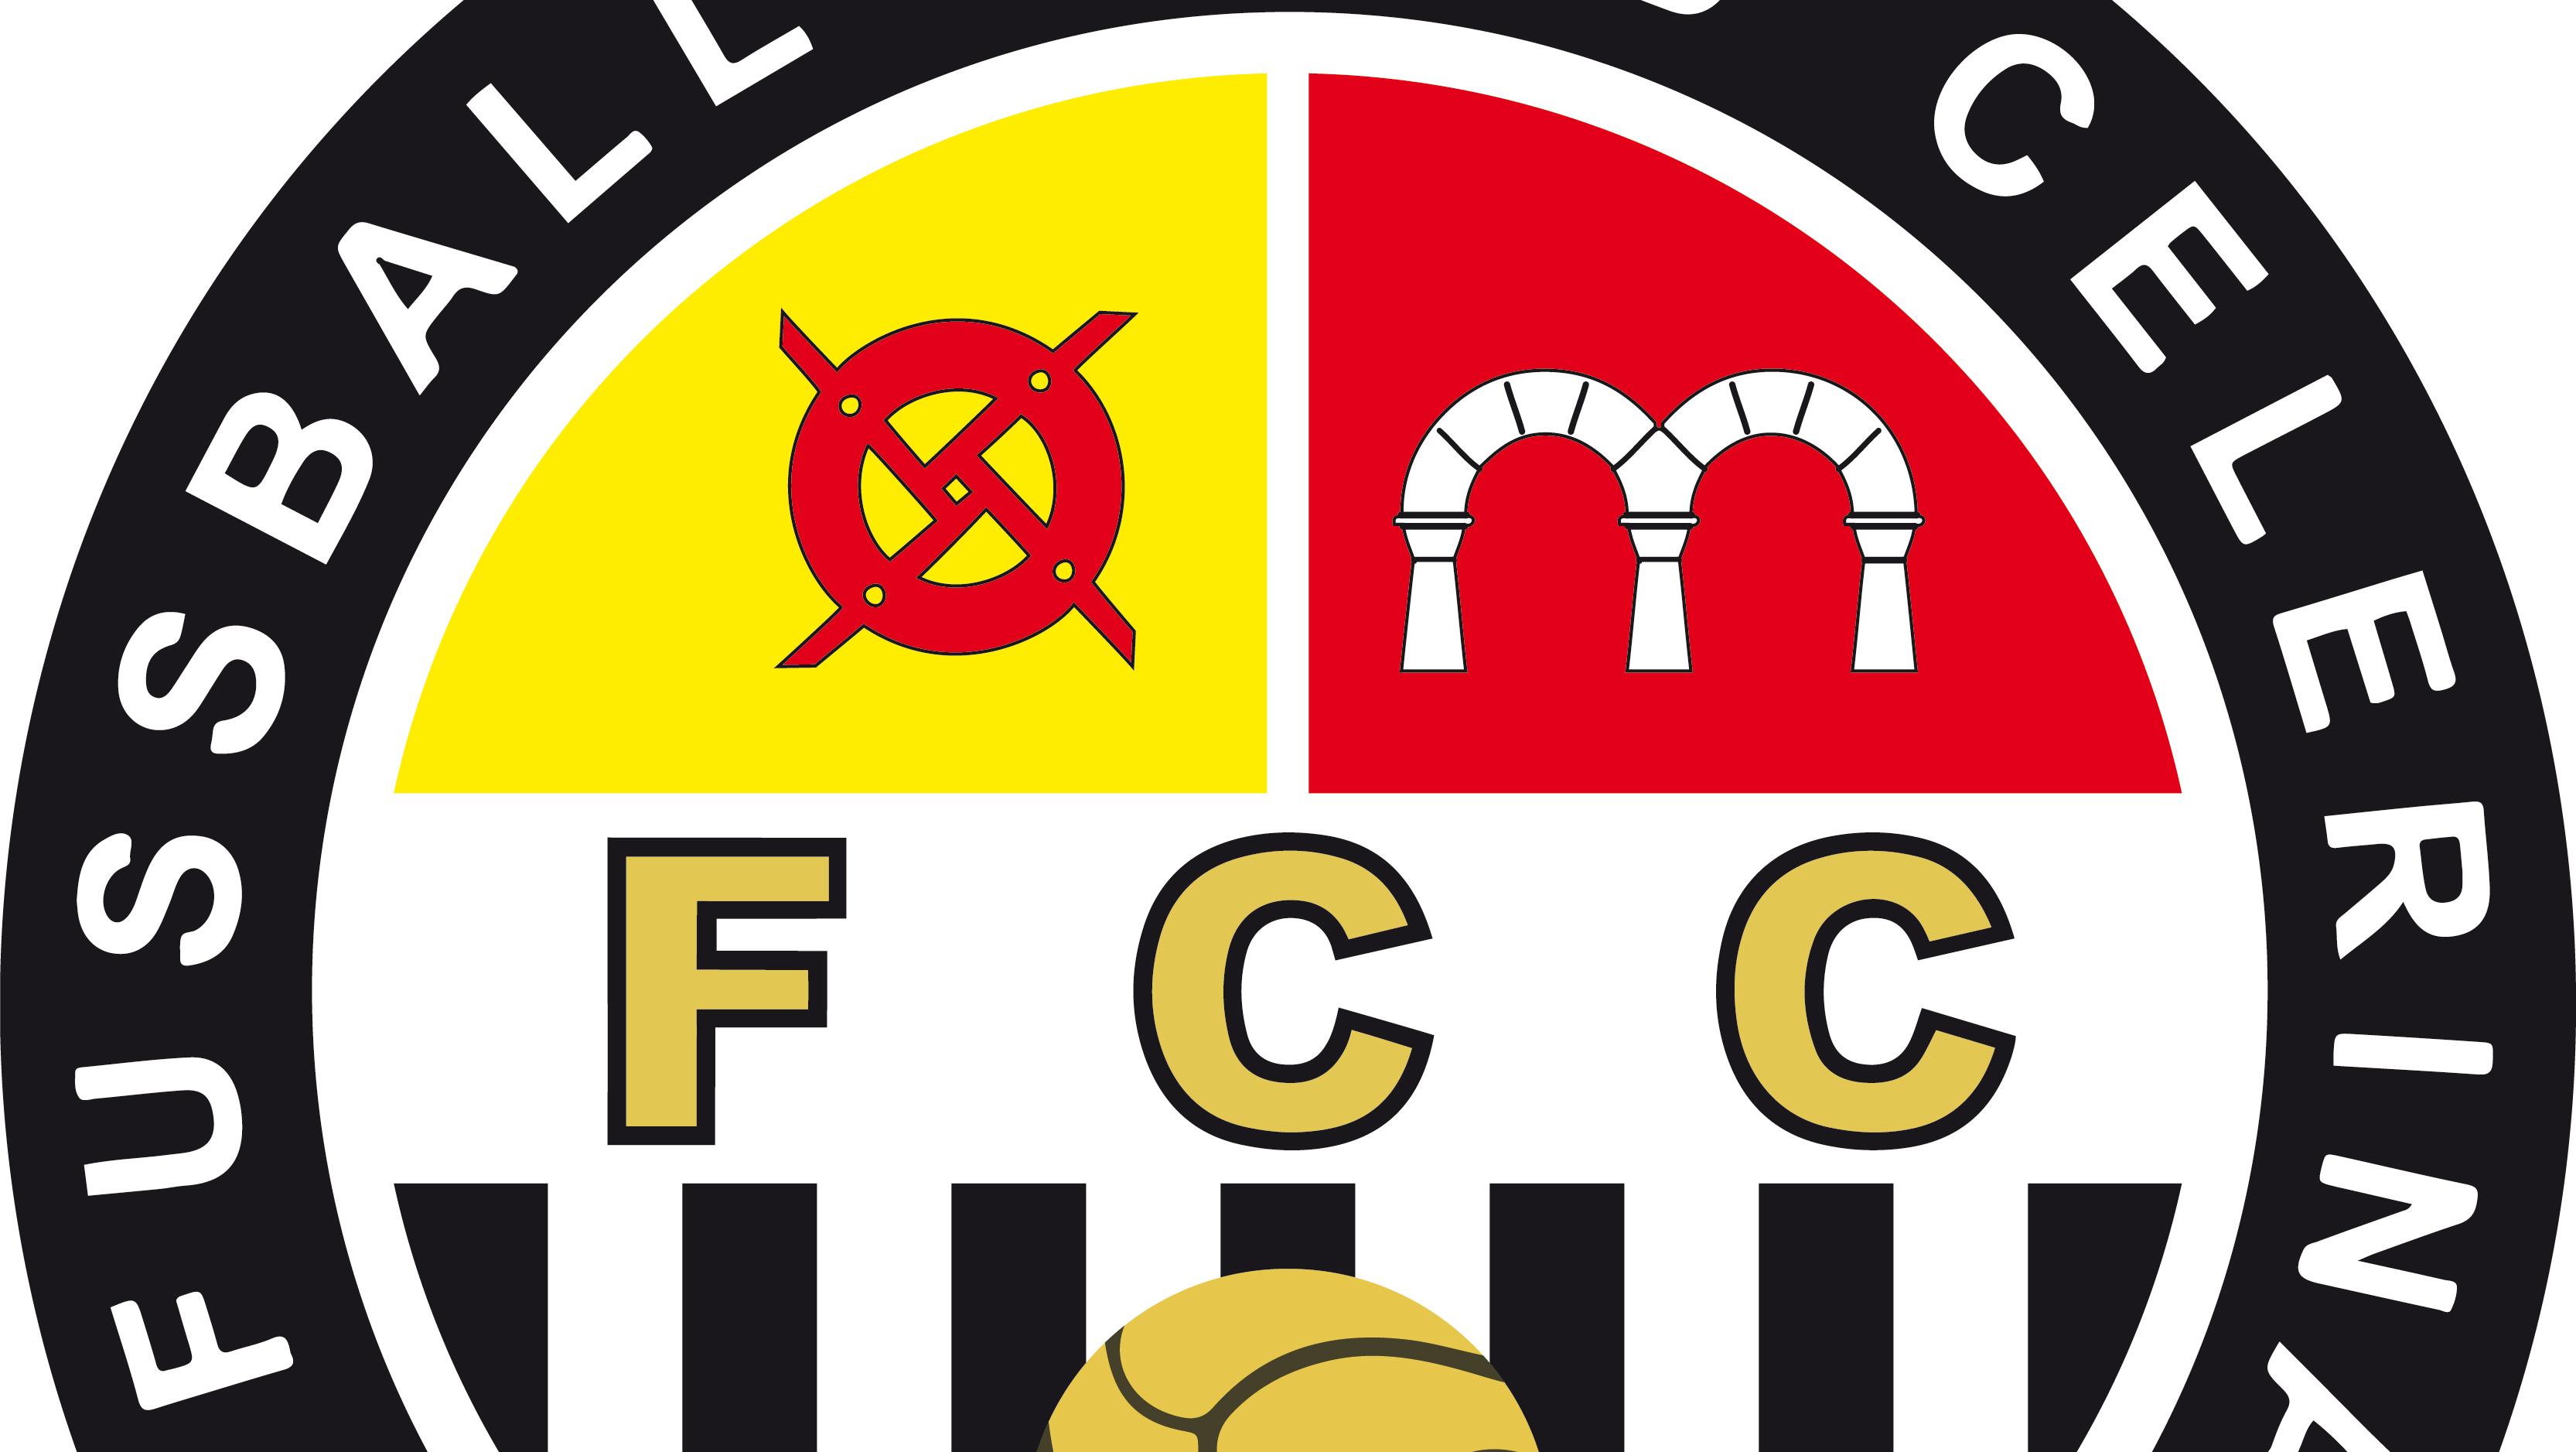 Knapper Auswärtssieg für den FC Celerina.